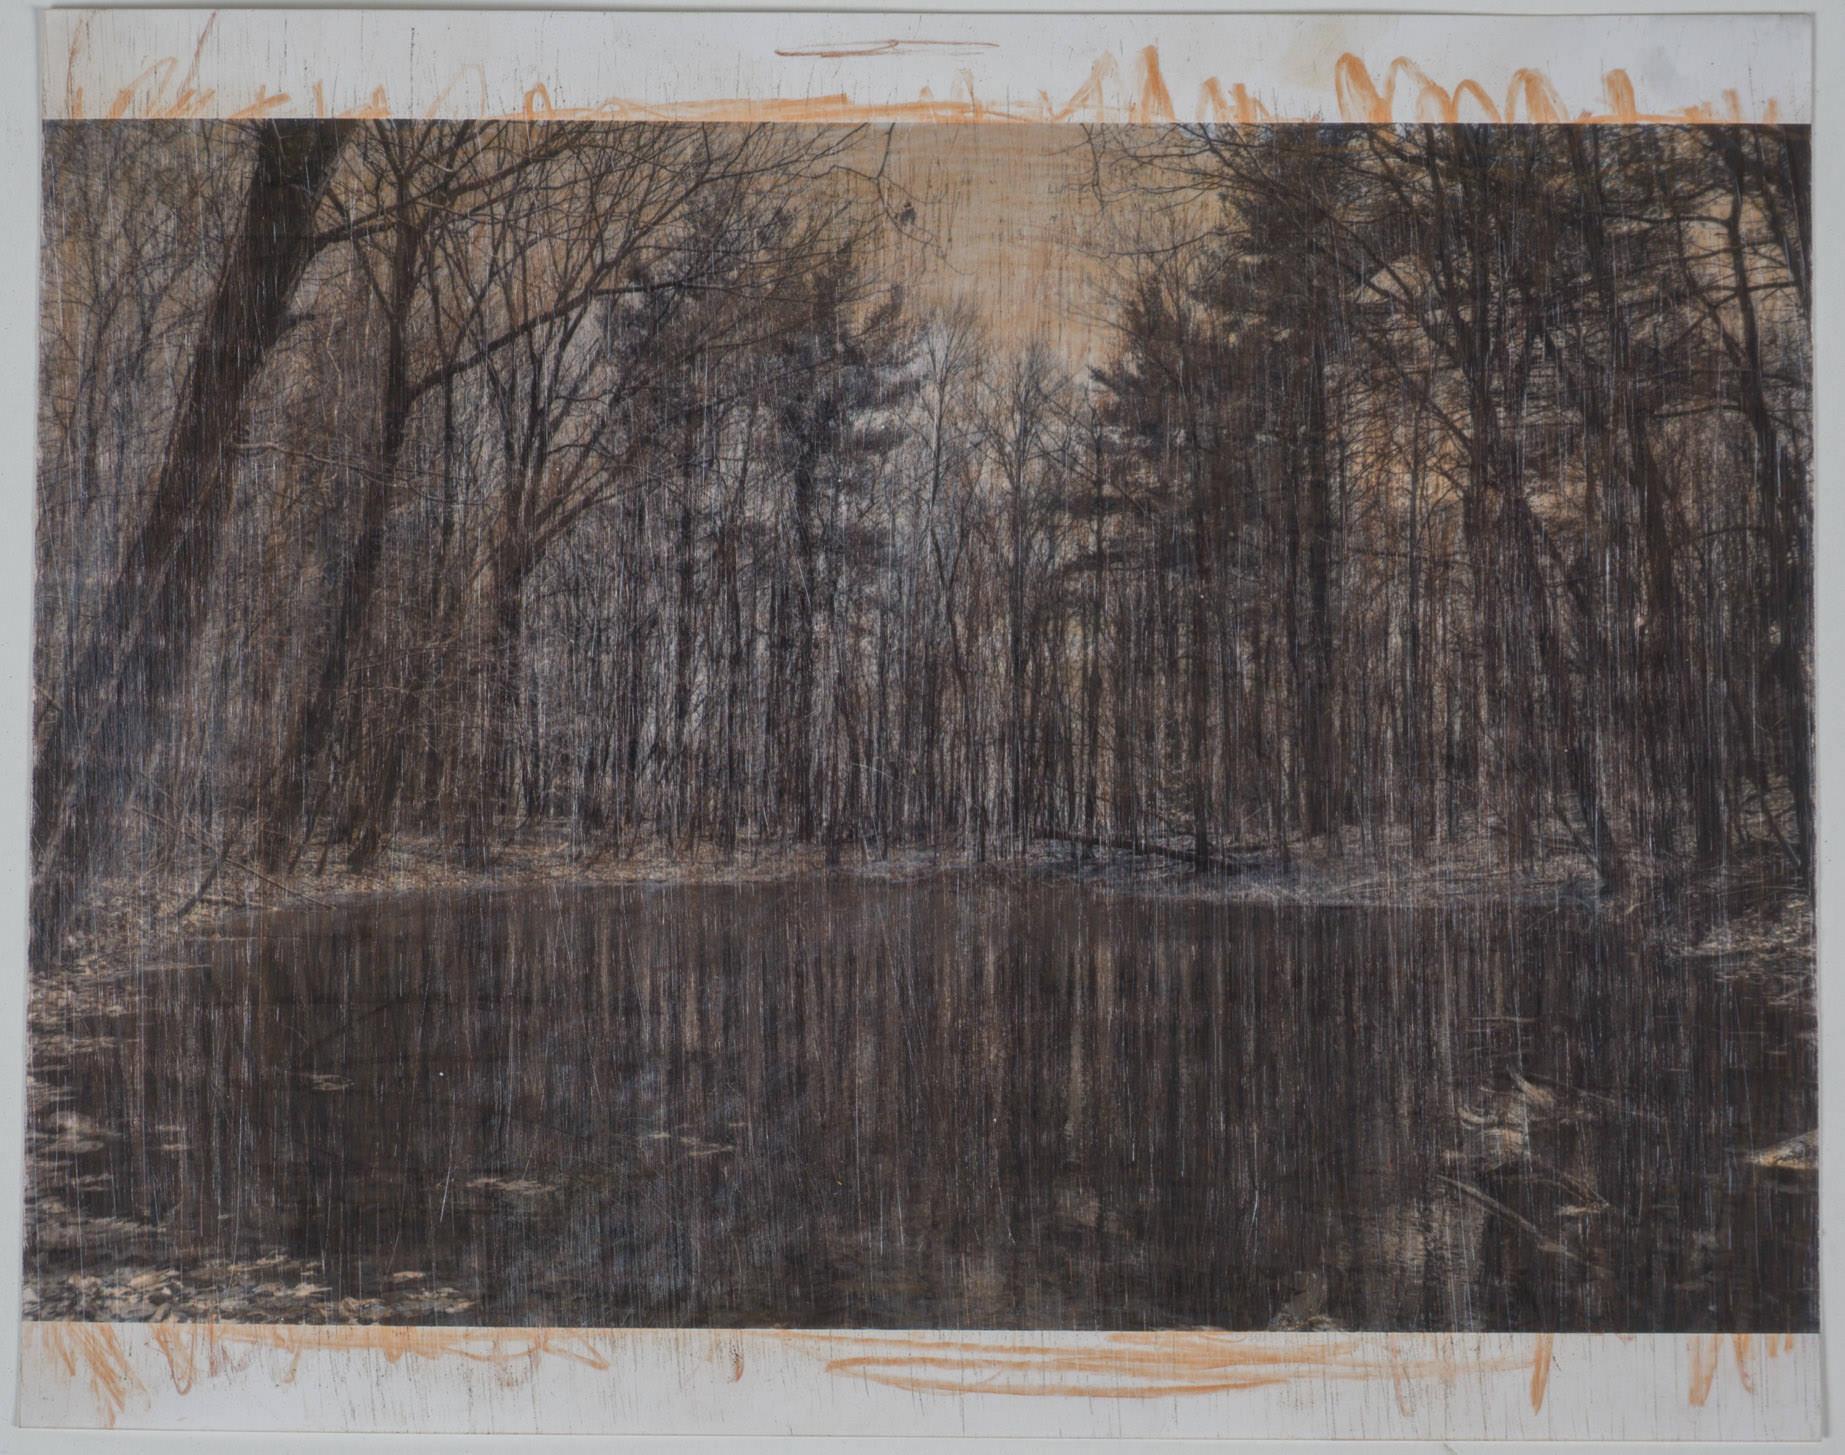 Woods pond  (8x10 - sanded print - pencil